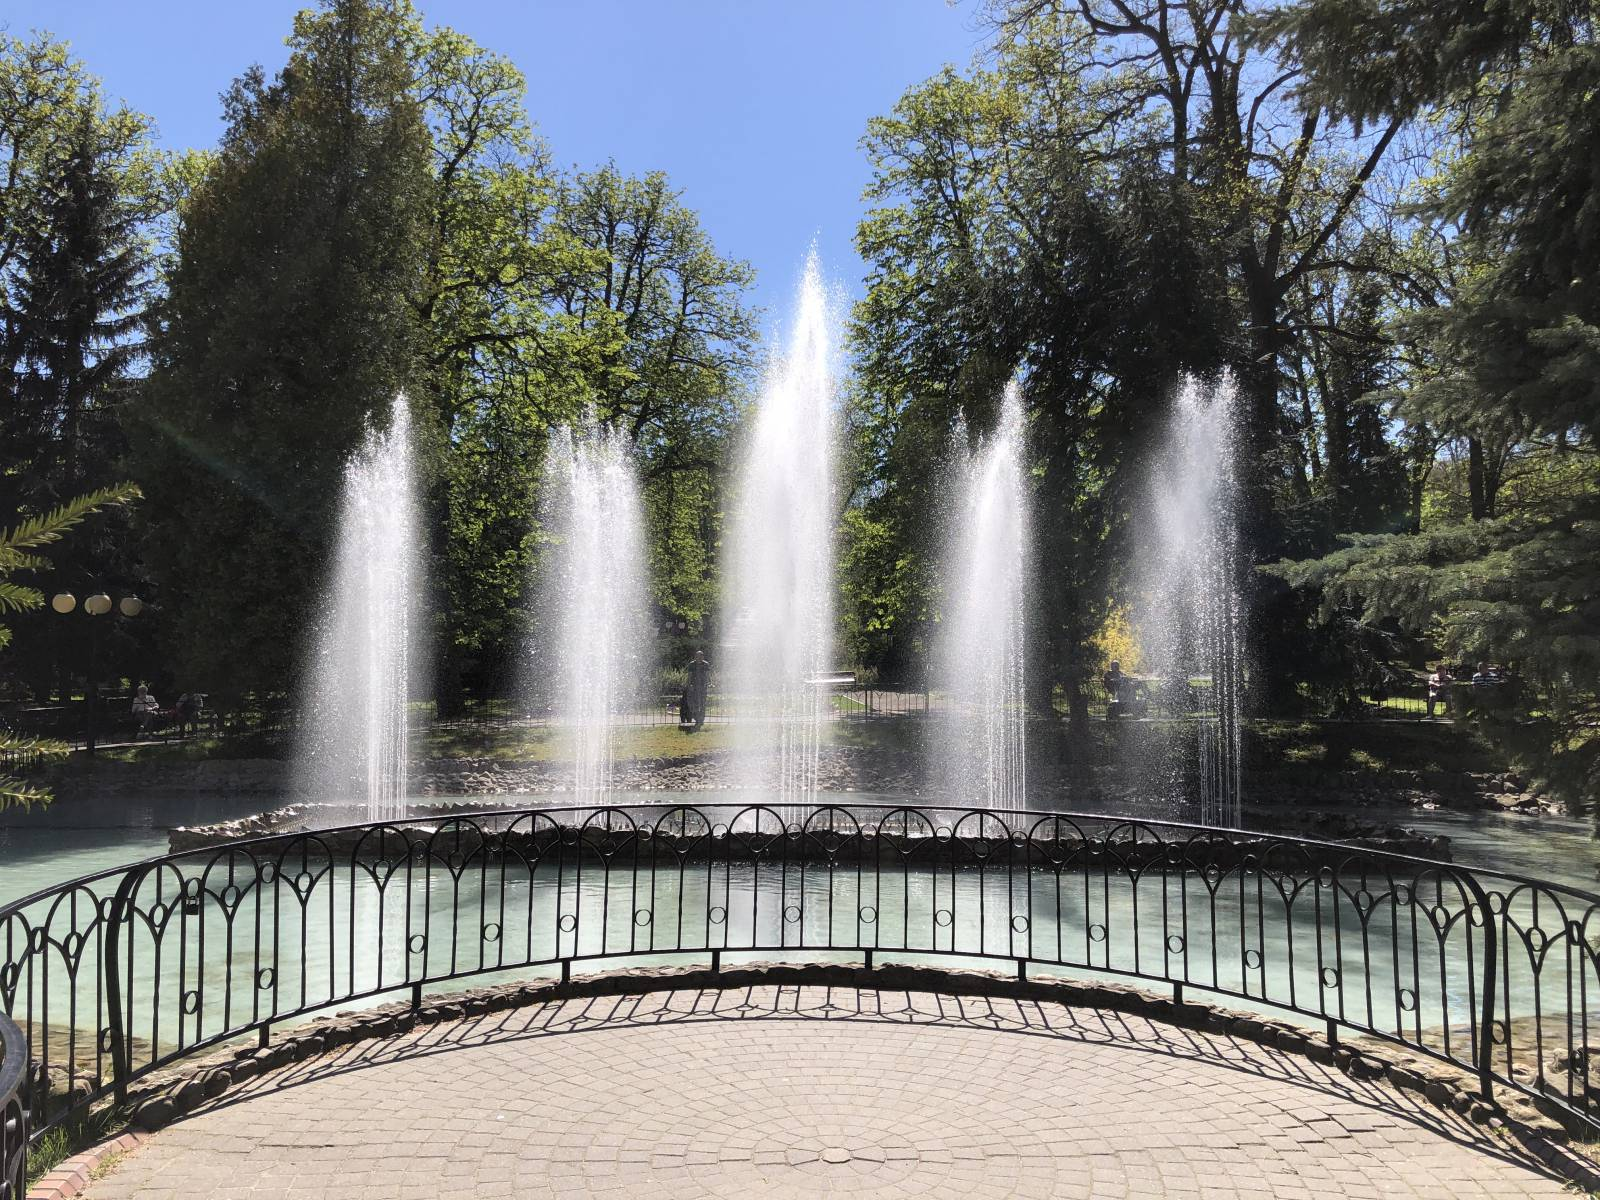 pokazy fontanny